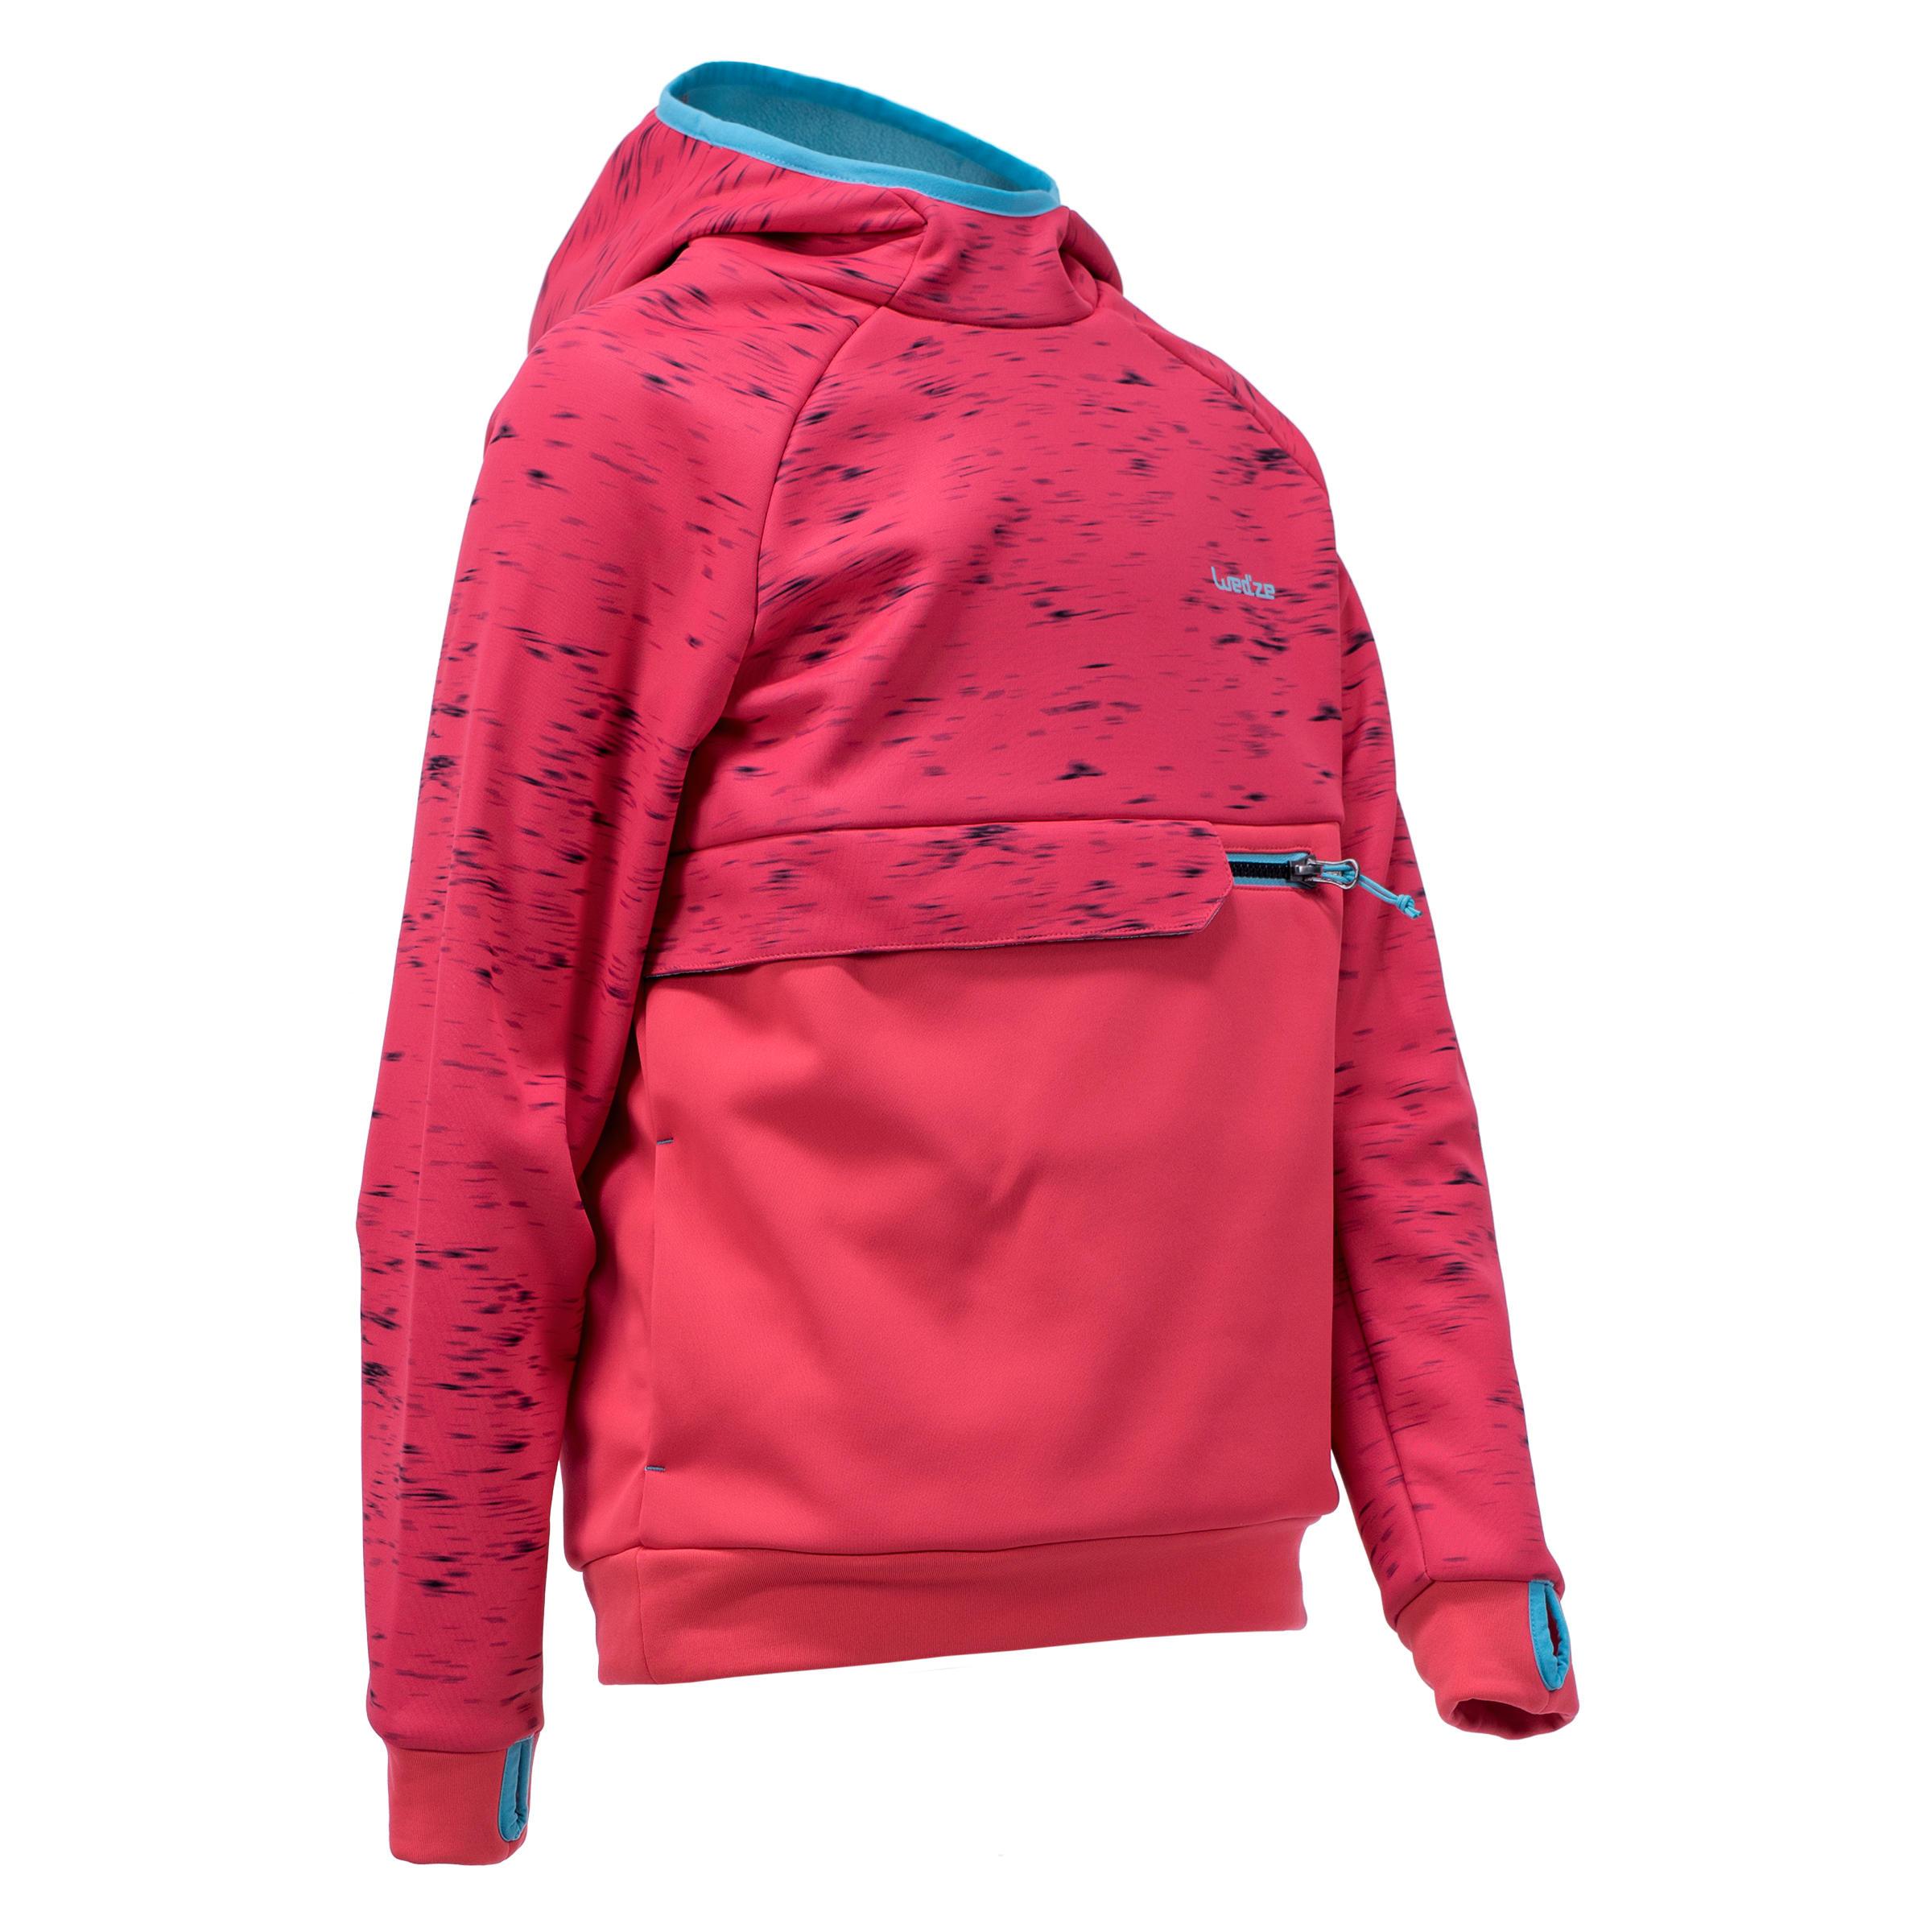 Wedze Sweatshirt de snowboard et de ski SNB HDY fille rose fraise - Wedze